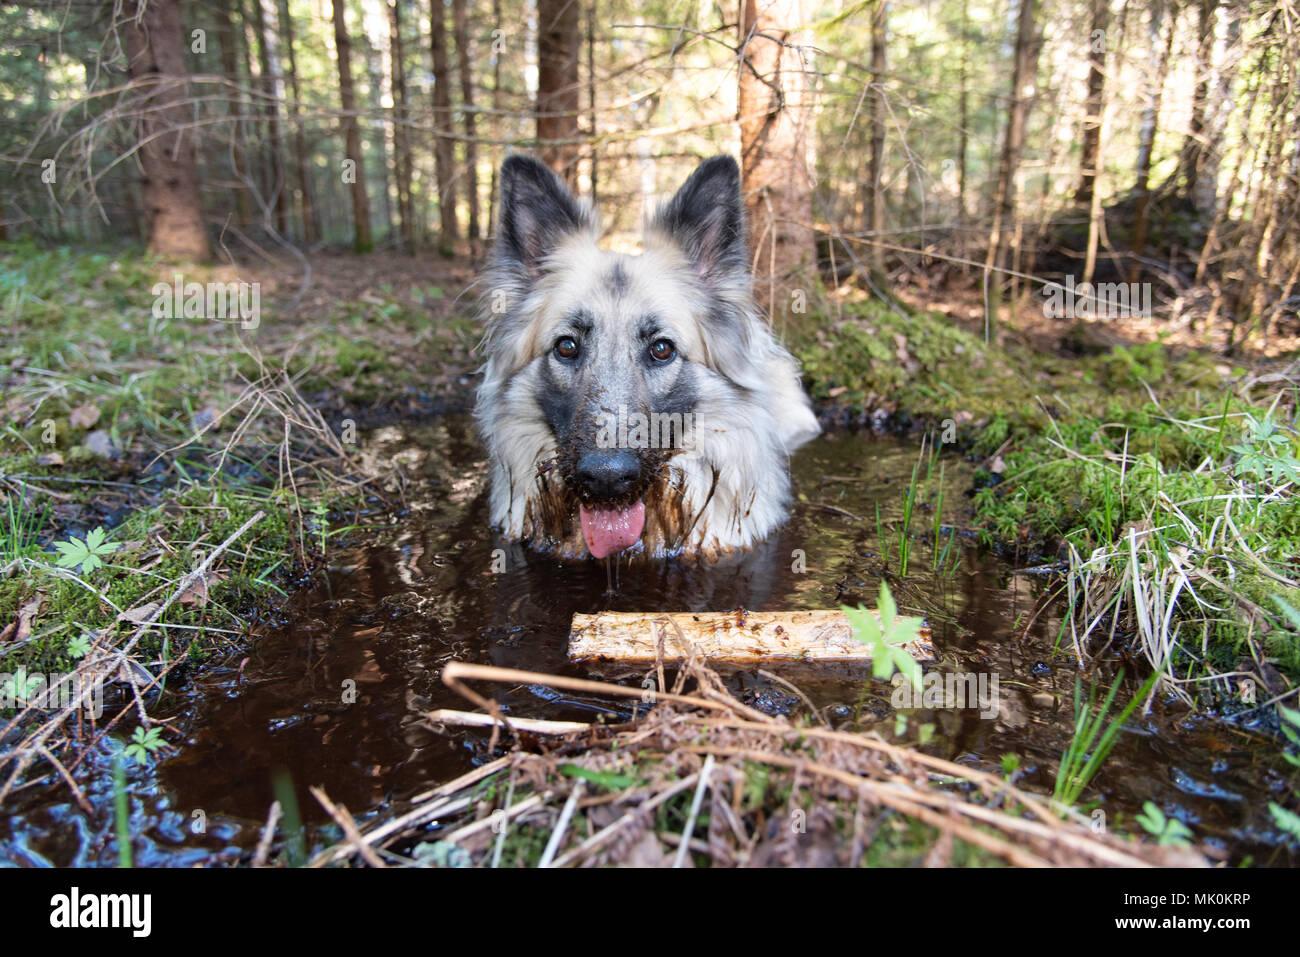 german shepherd taking a bath in a swedish forest - Stock Image